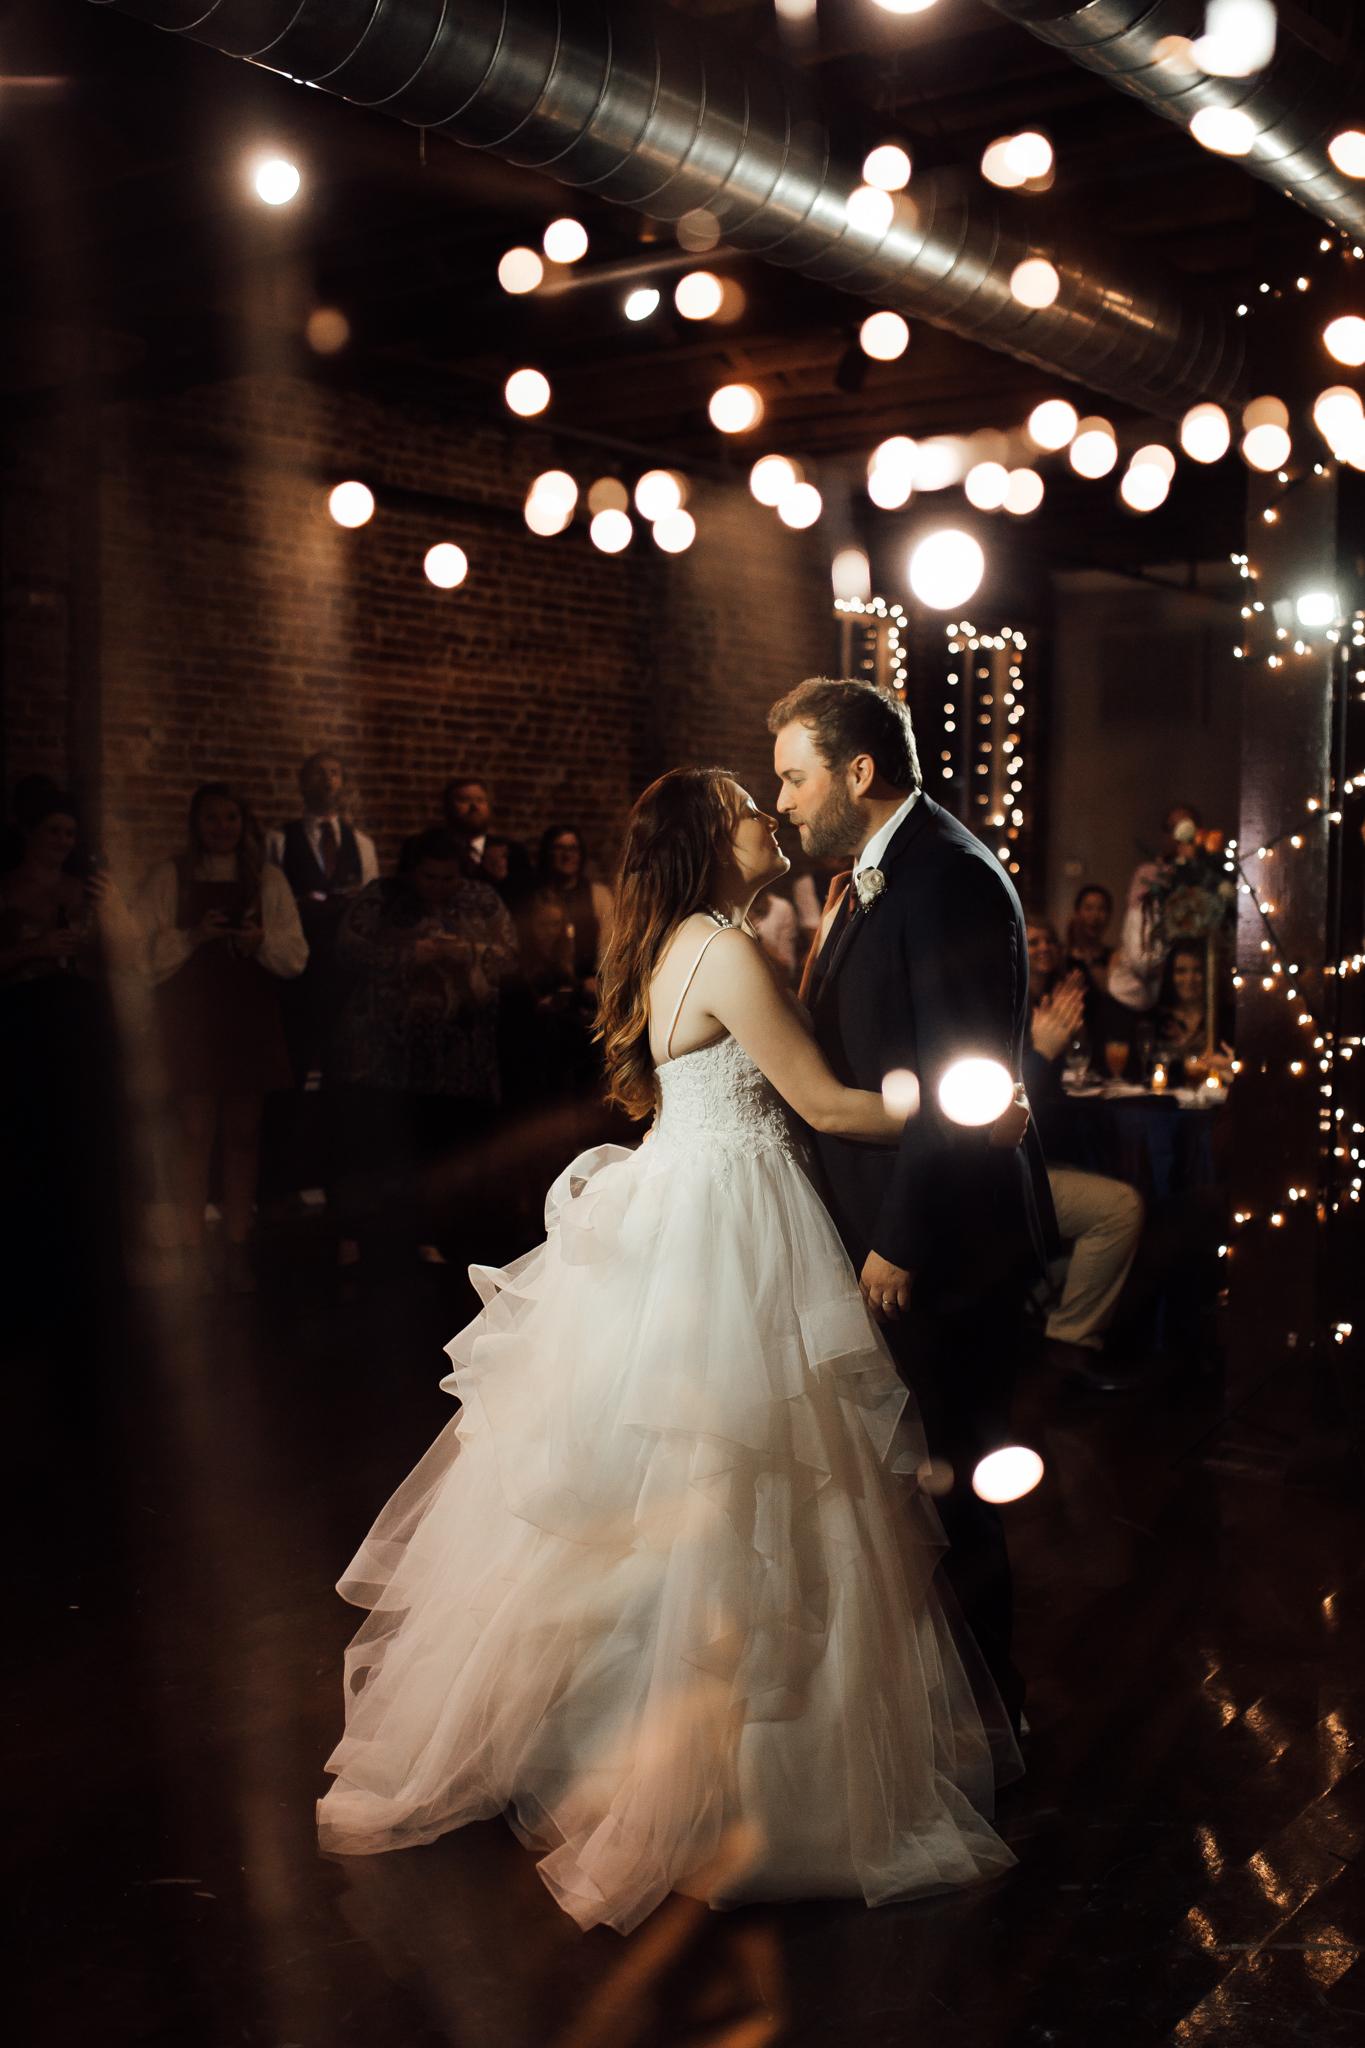 memphis-wedding-photographers-thewarmtharoundyou-ballinese-ballroom (50 of 65).jpg